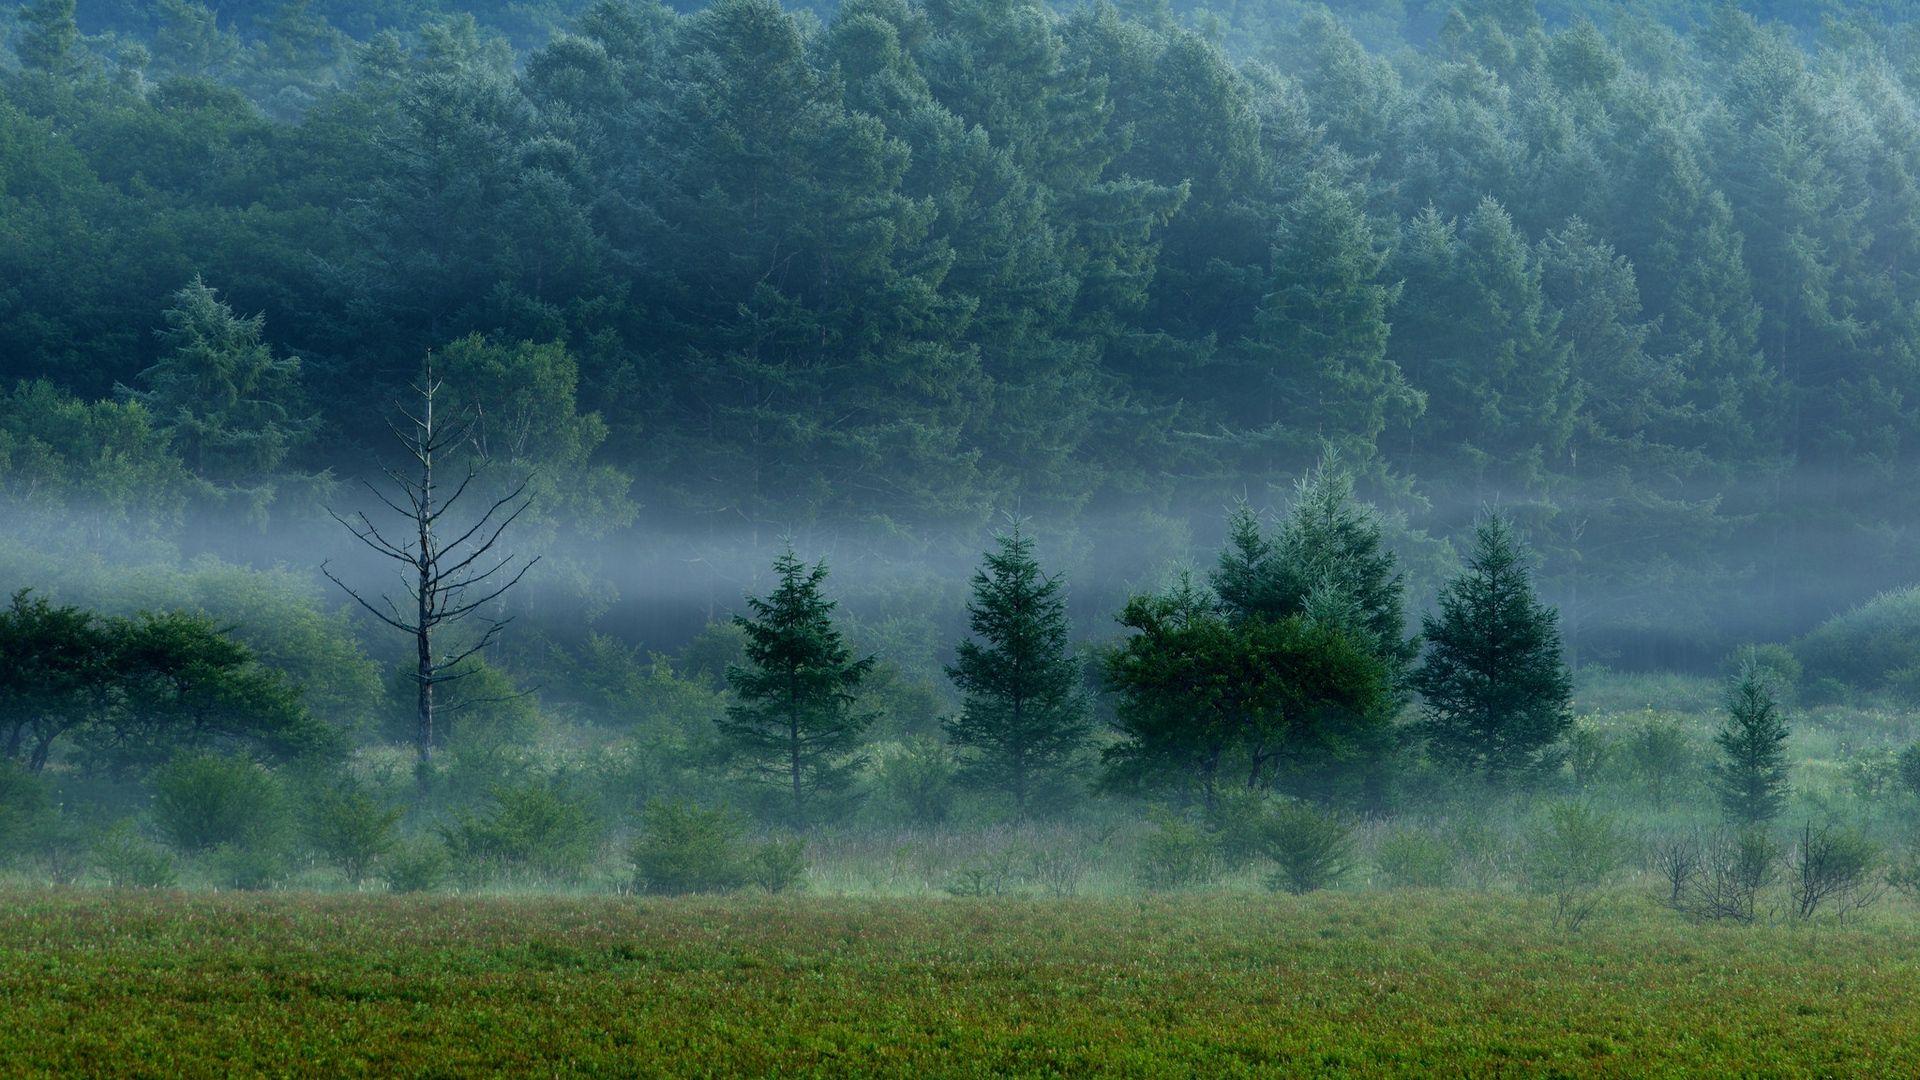 Foggy Forest full screen hd wallpaper